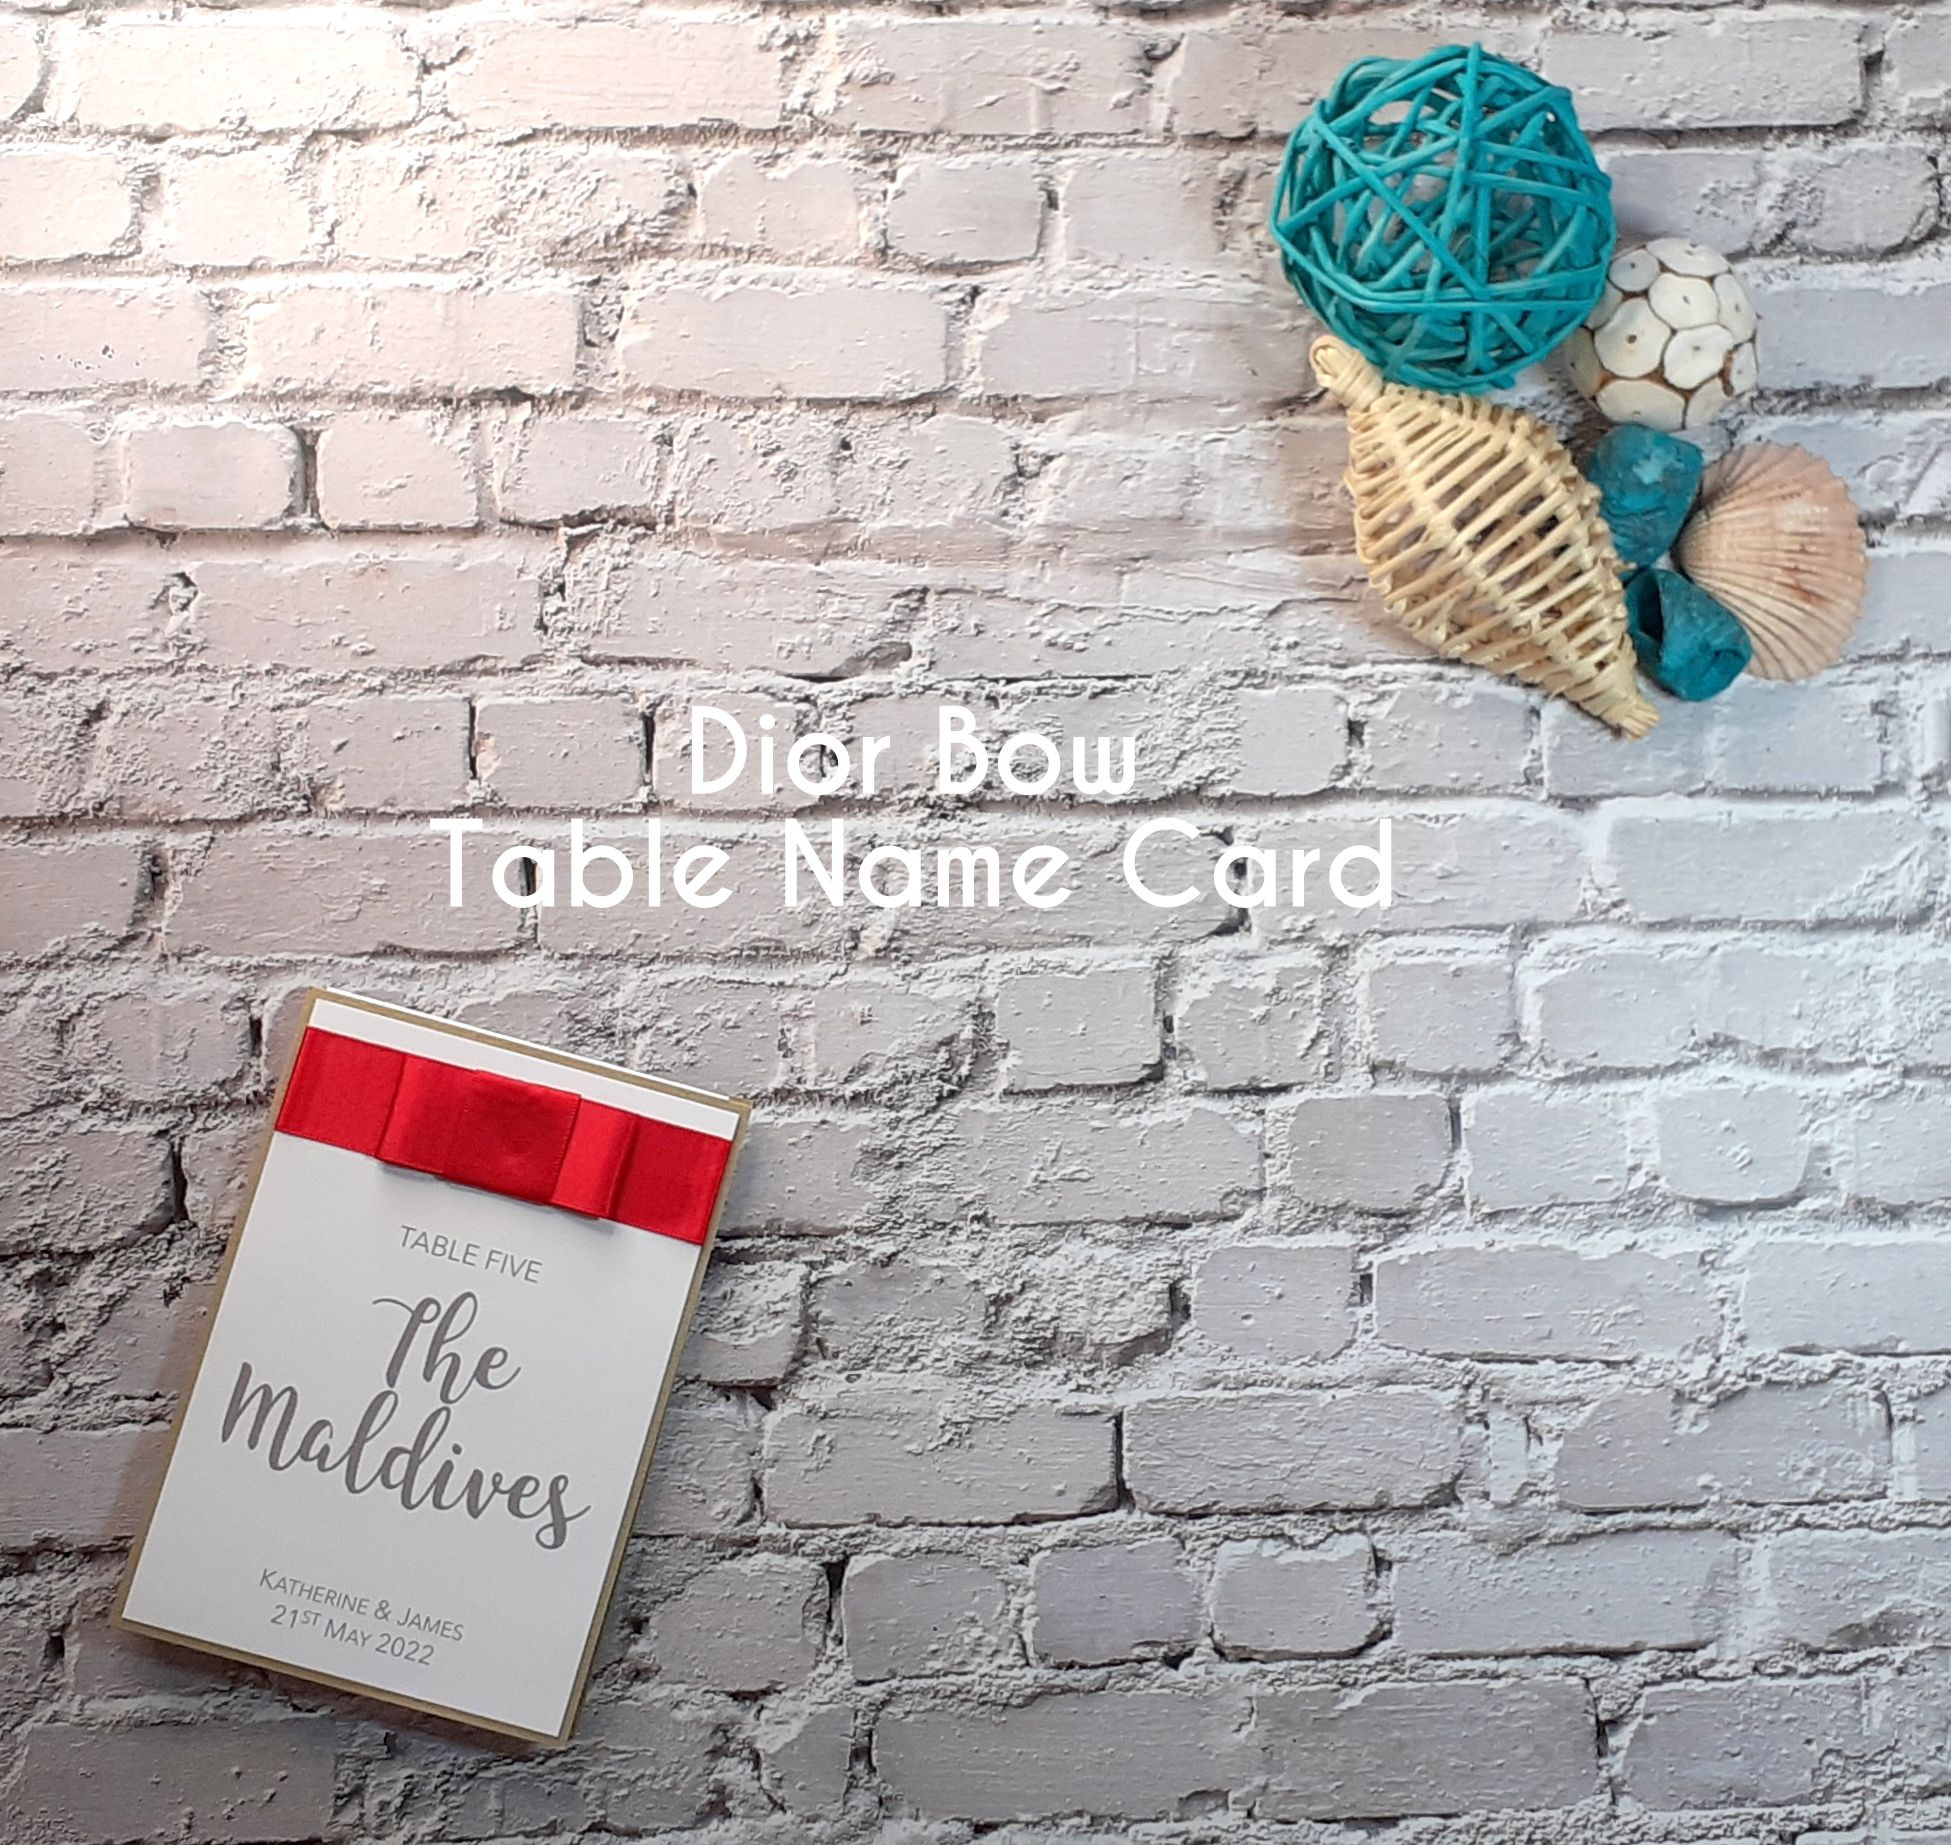 Dior Bow Table Name Card